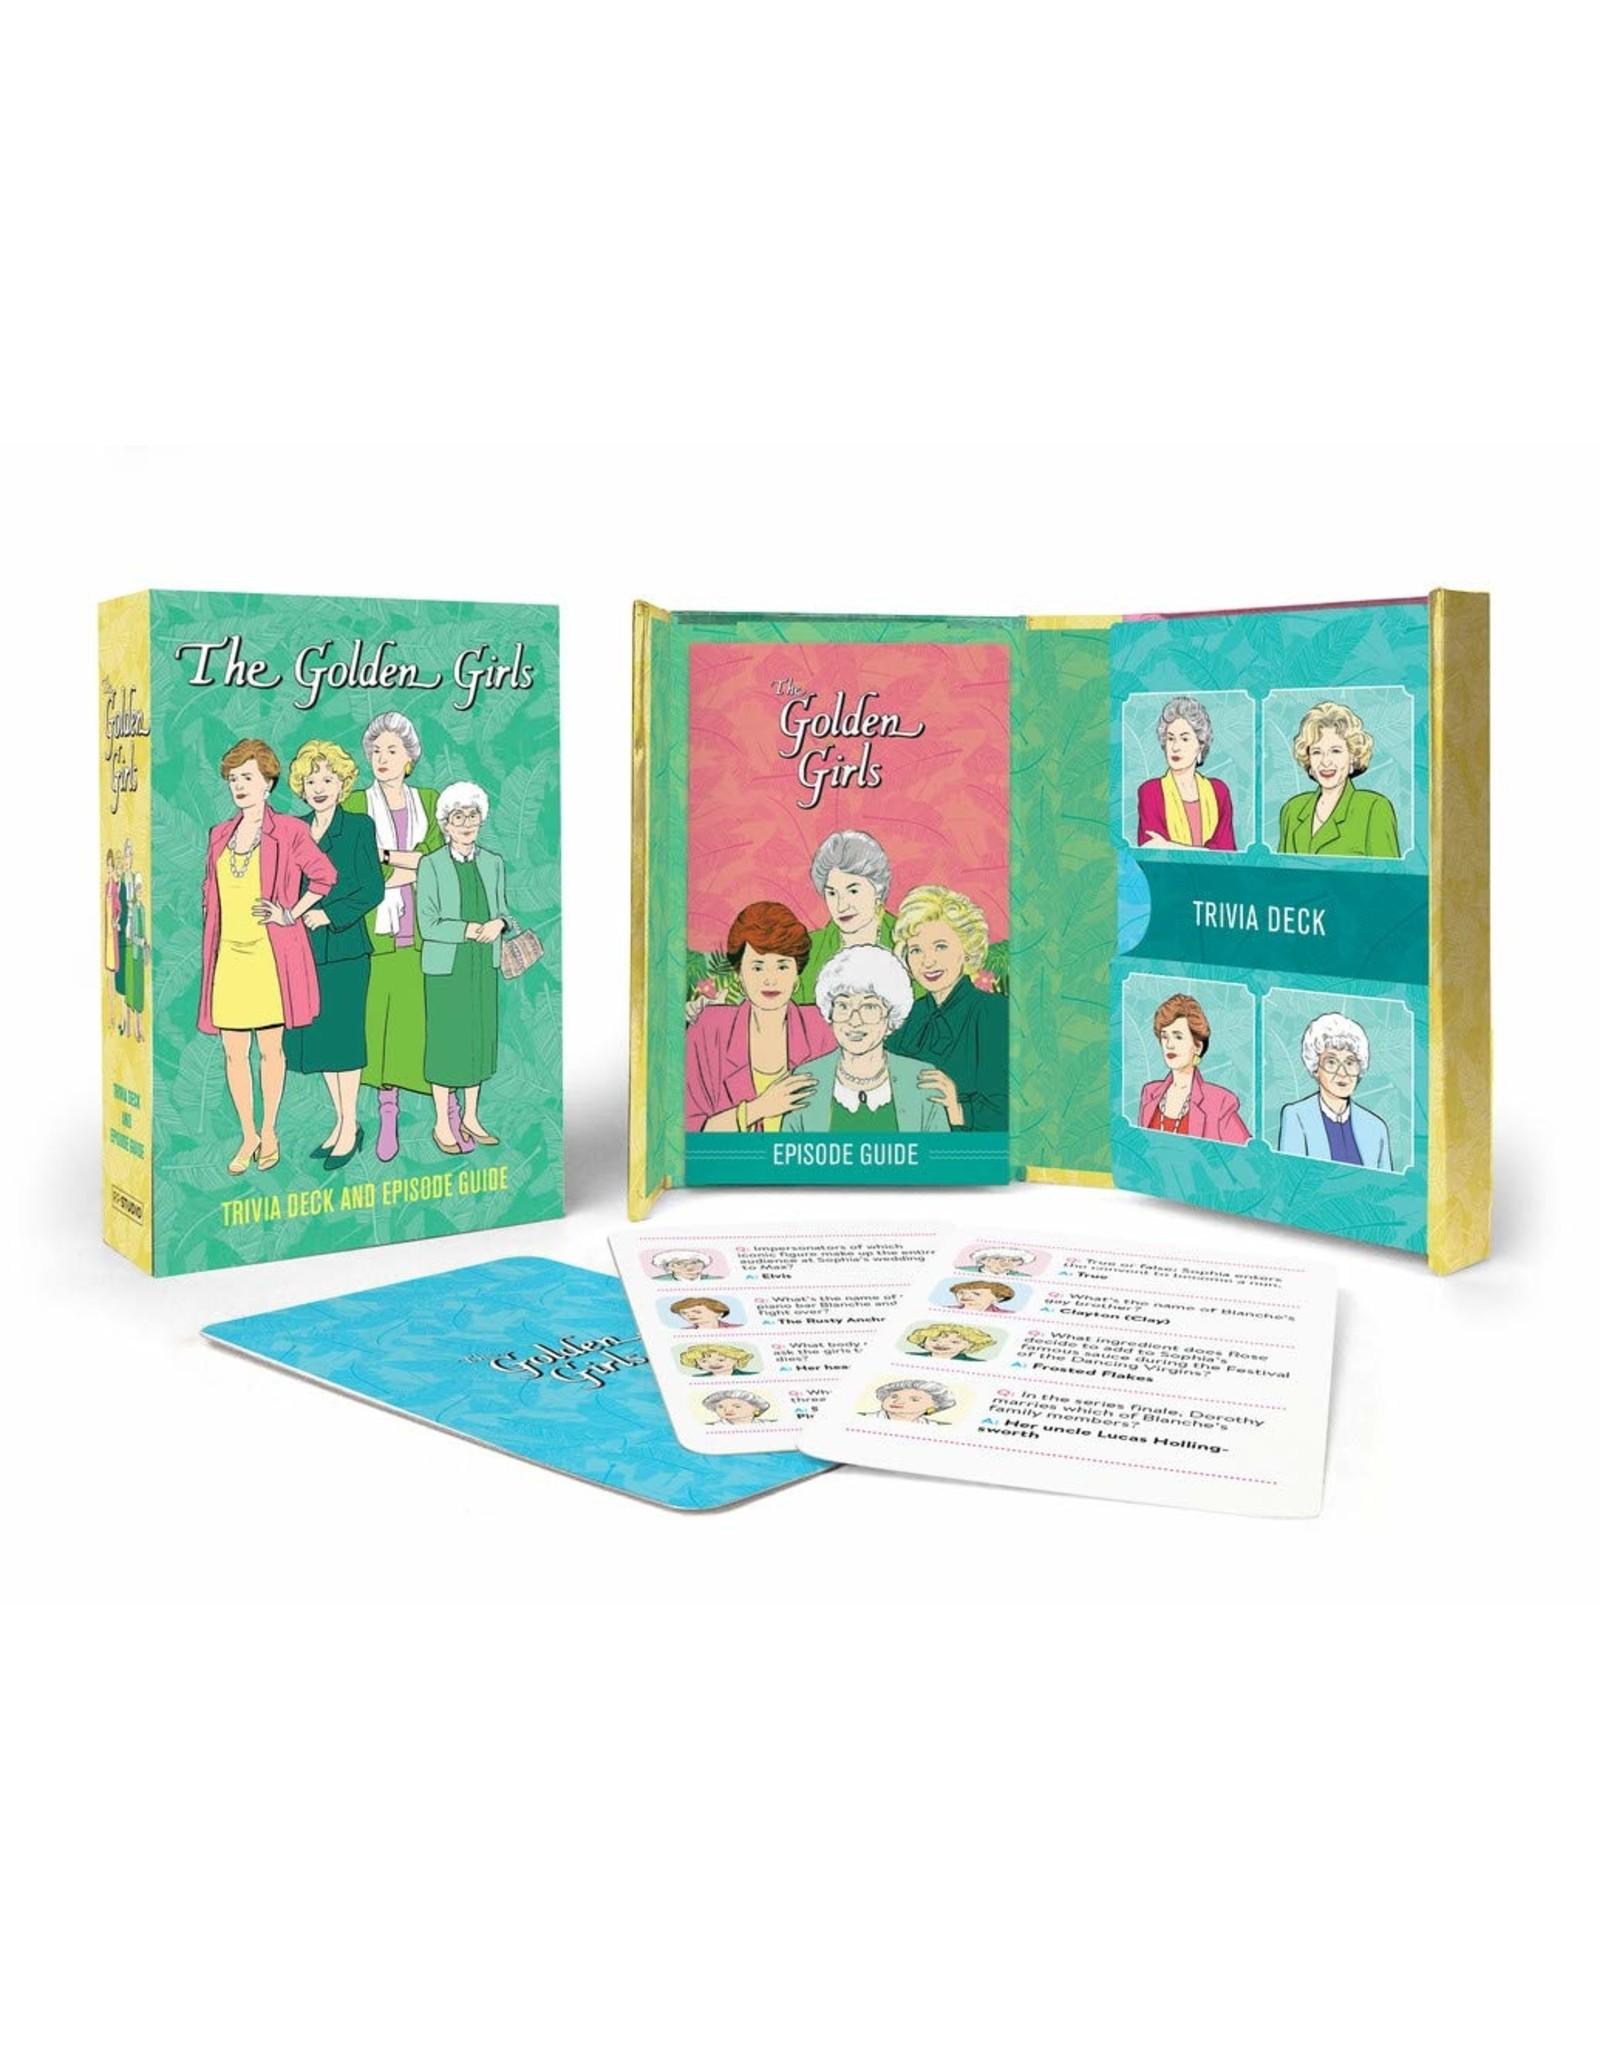 Hachette Golden Girls: Trivia Deck and Episode Guide